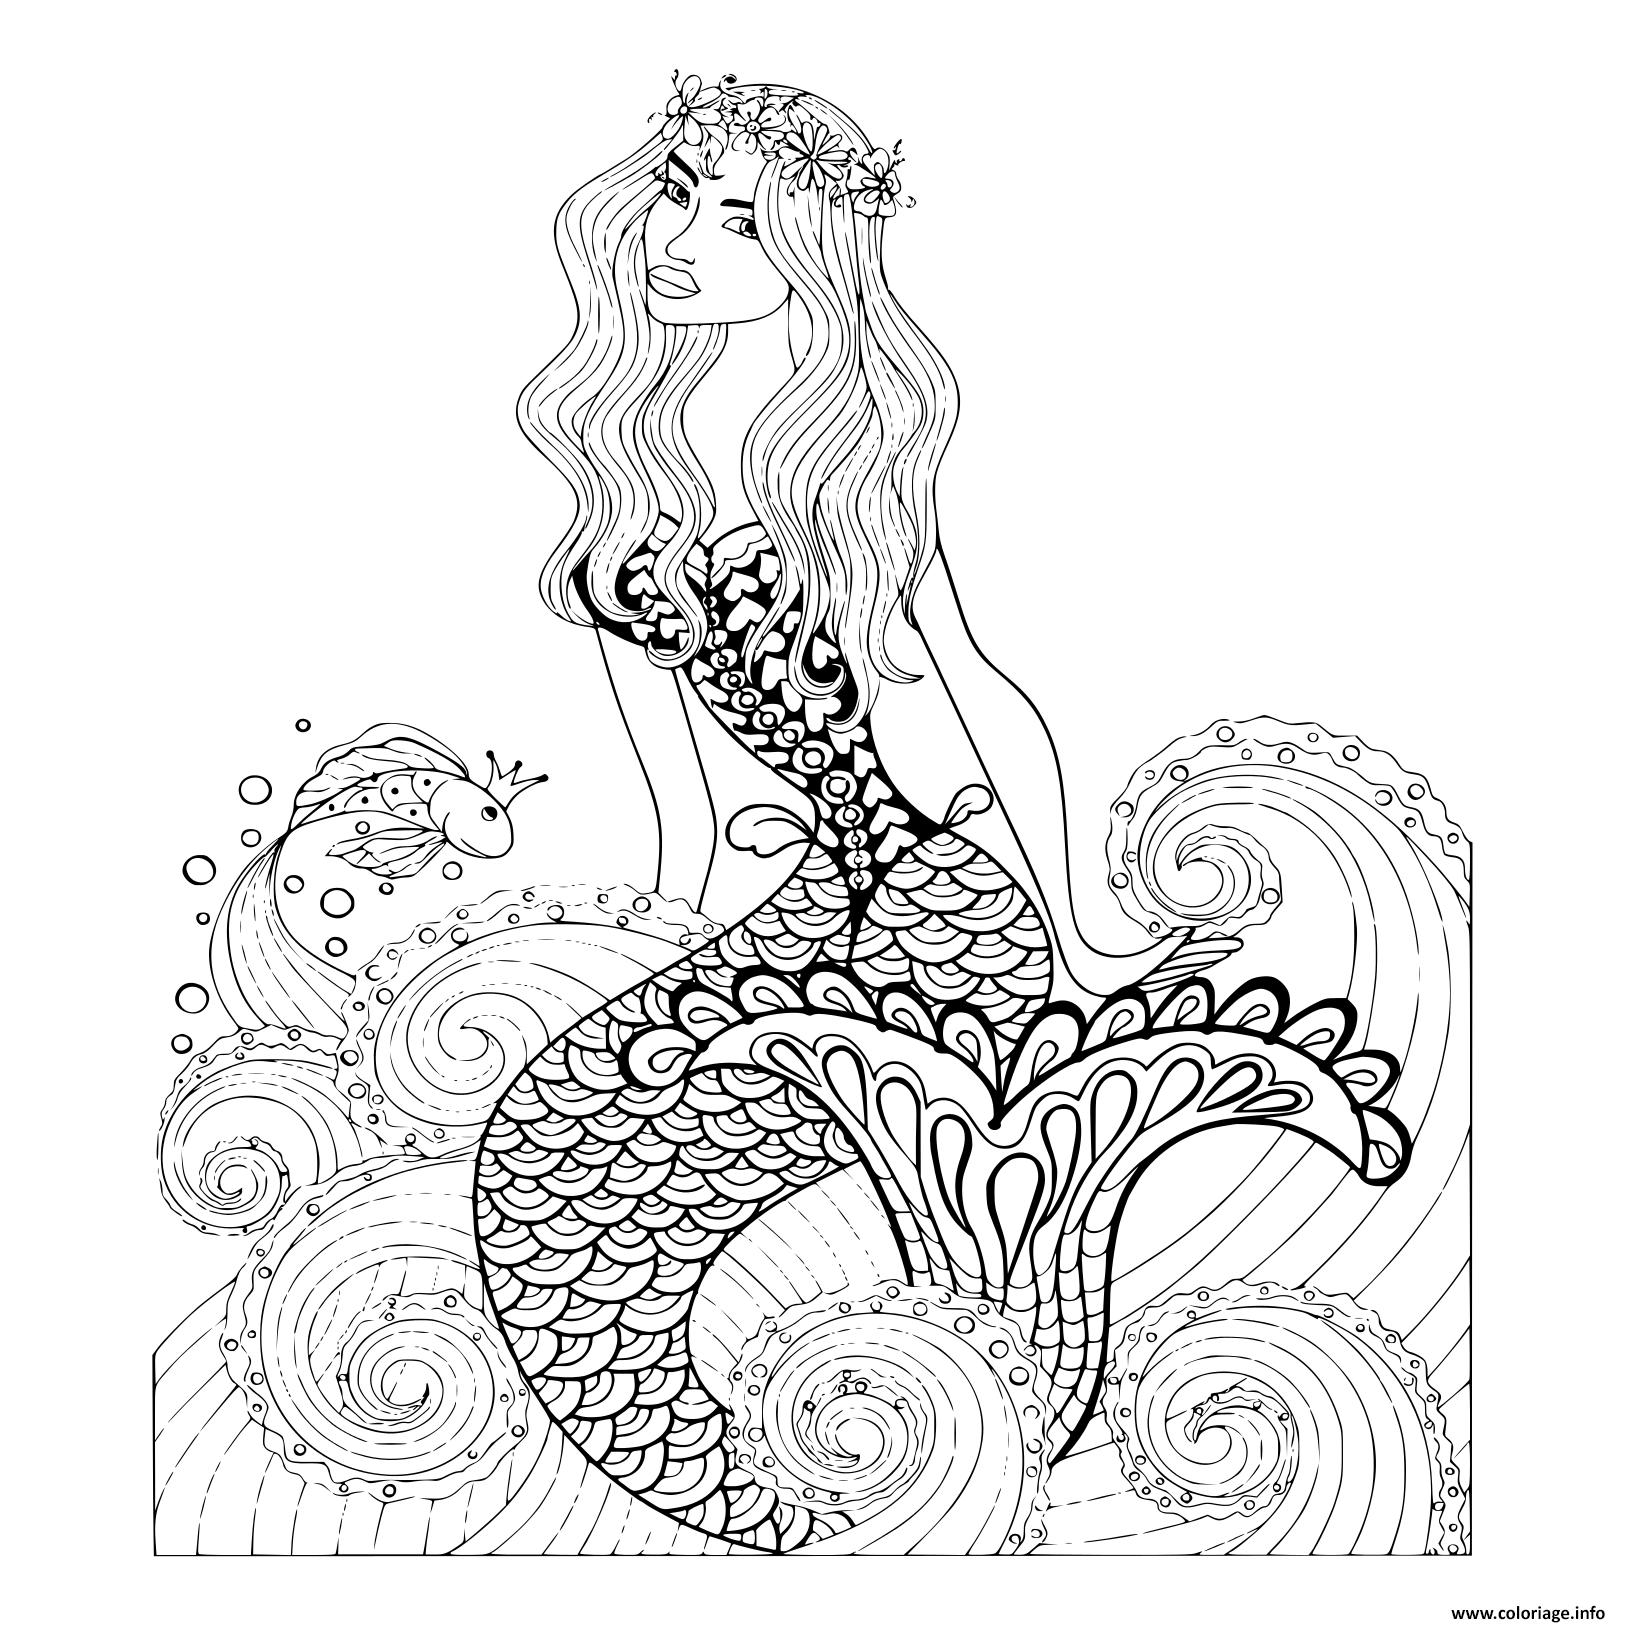 Kleurplaten Voor Volwassenen Paard Coloriage Fantastique Sirene Vagues De Mer Avec Un Poisson